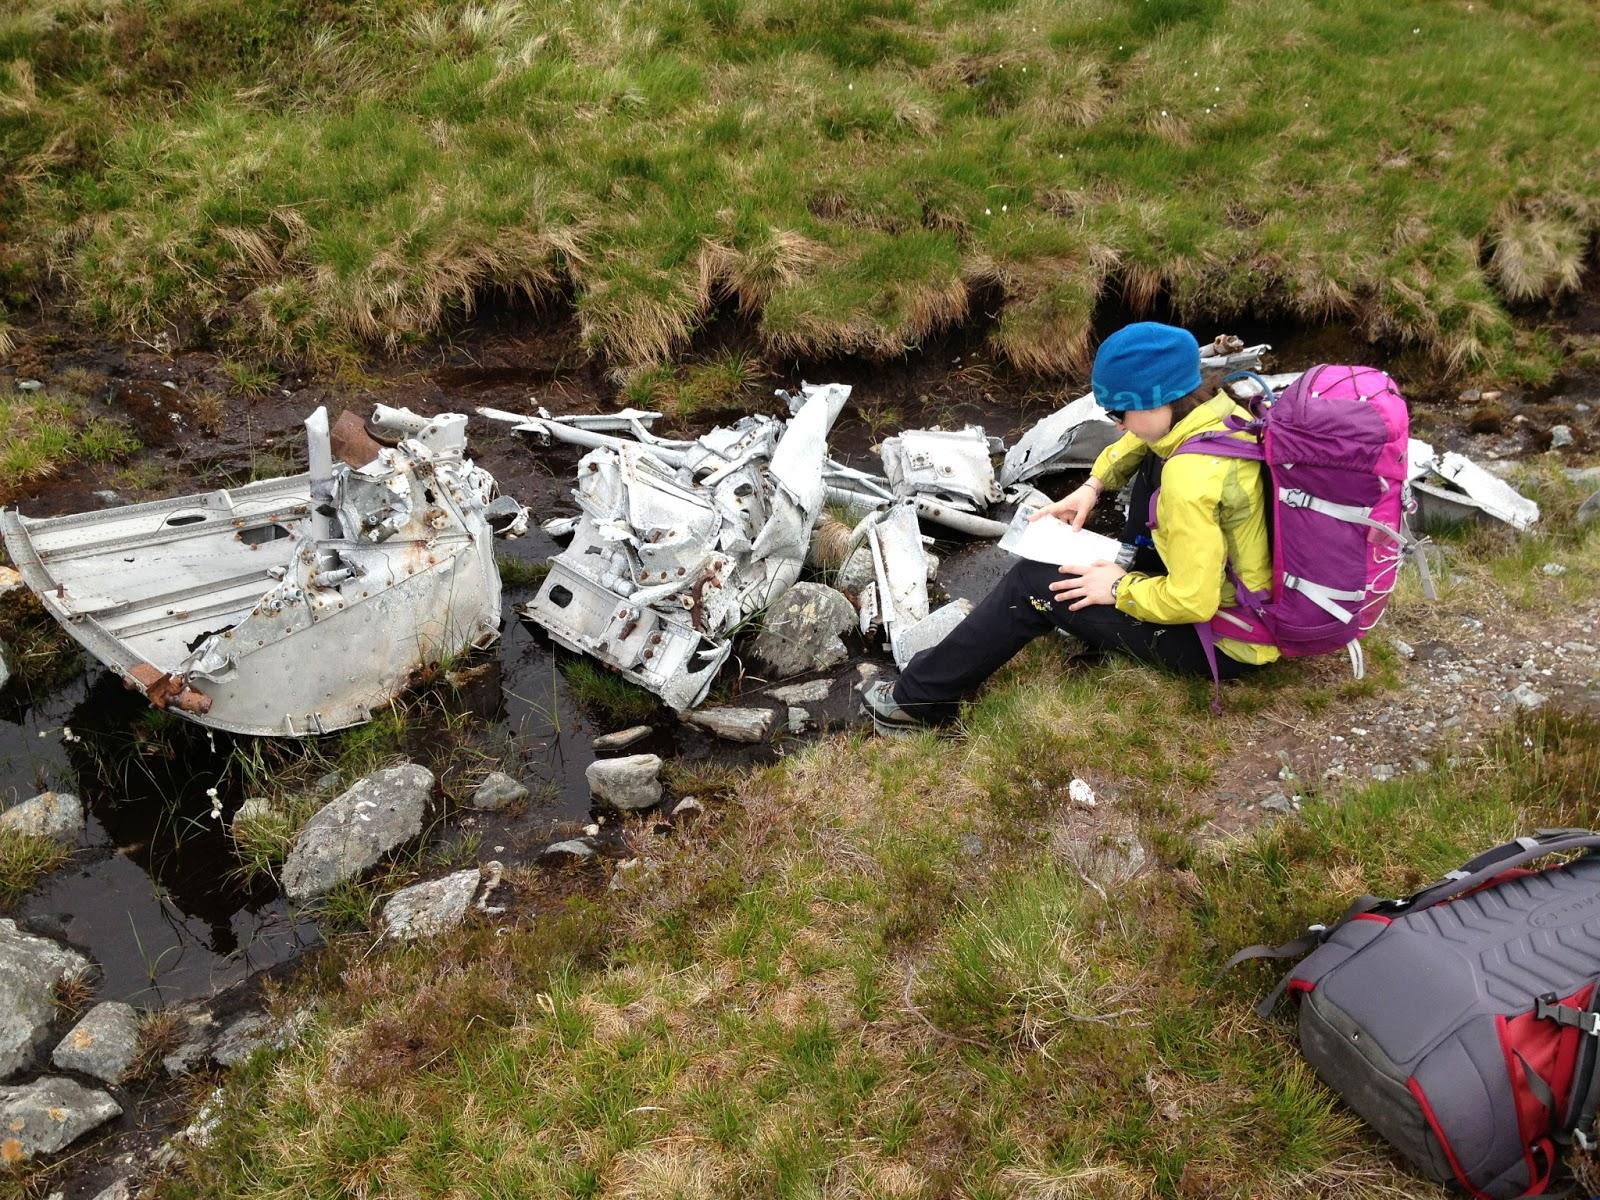 aaliyah plane crash victim - HD1600×1200